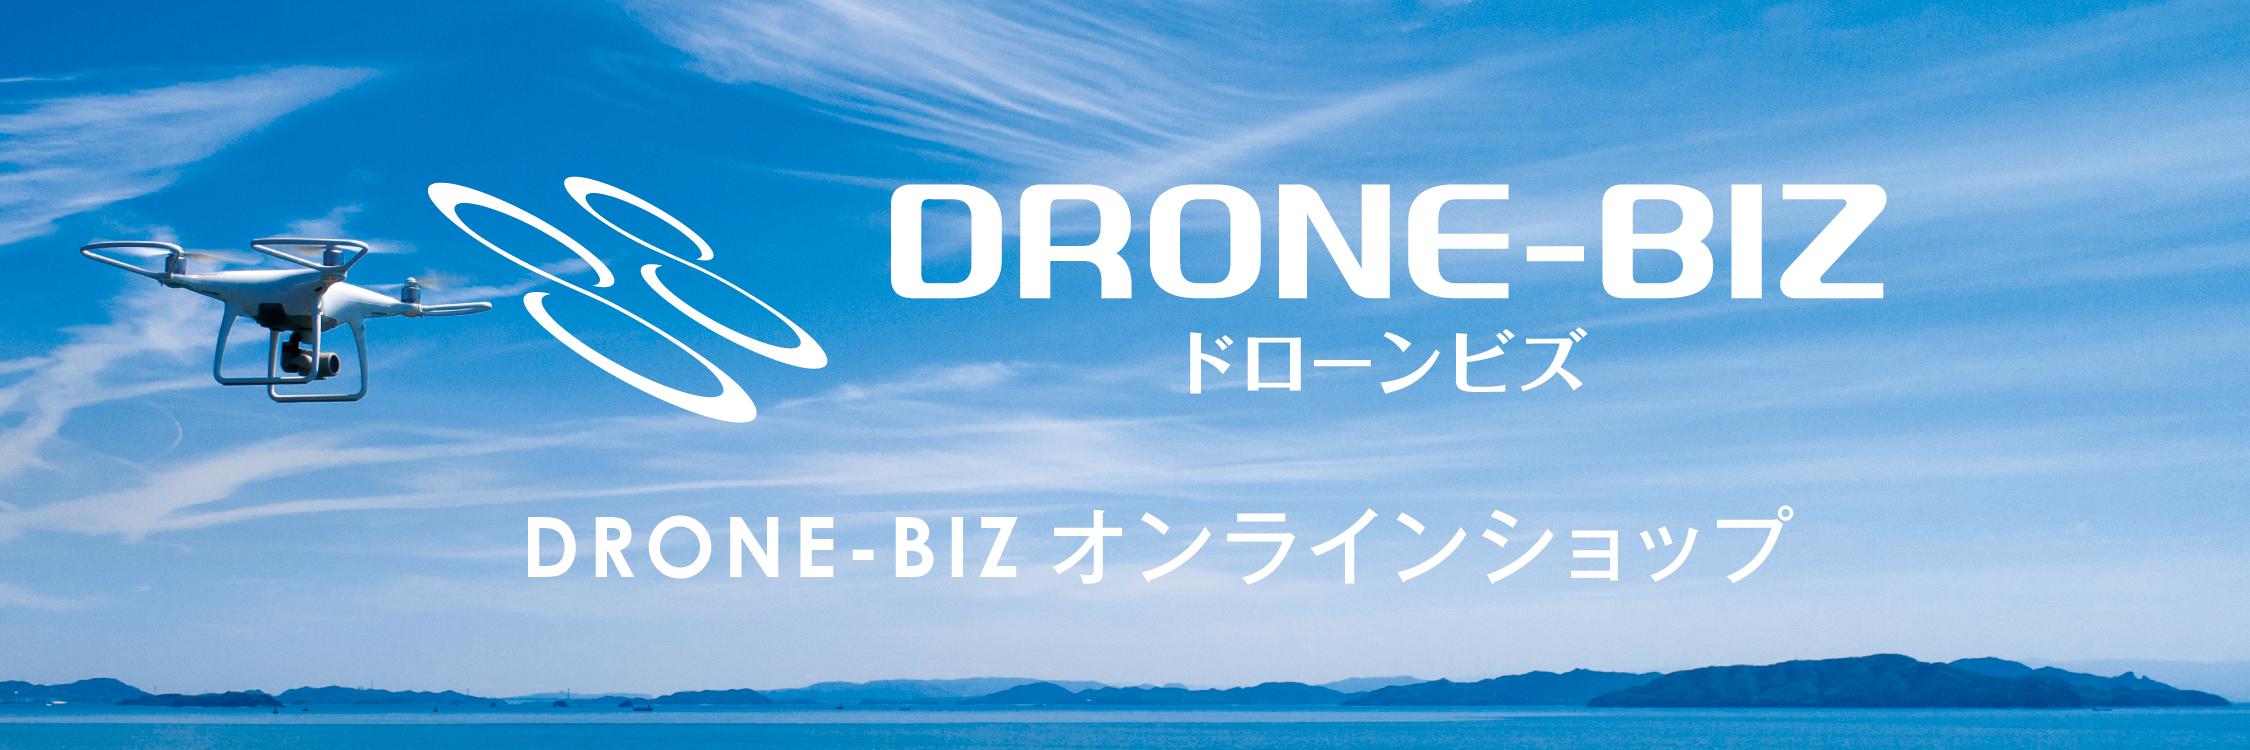 DRONE-BIZ オンラインショップ